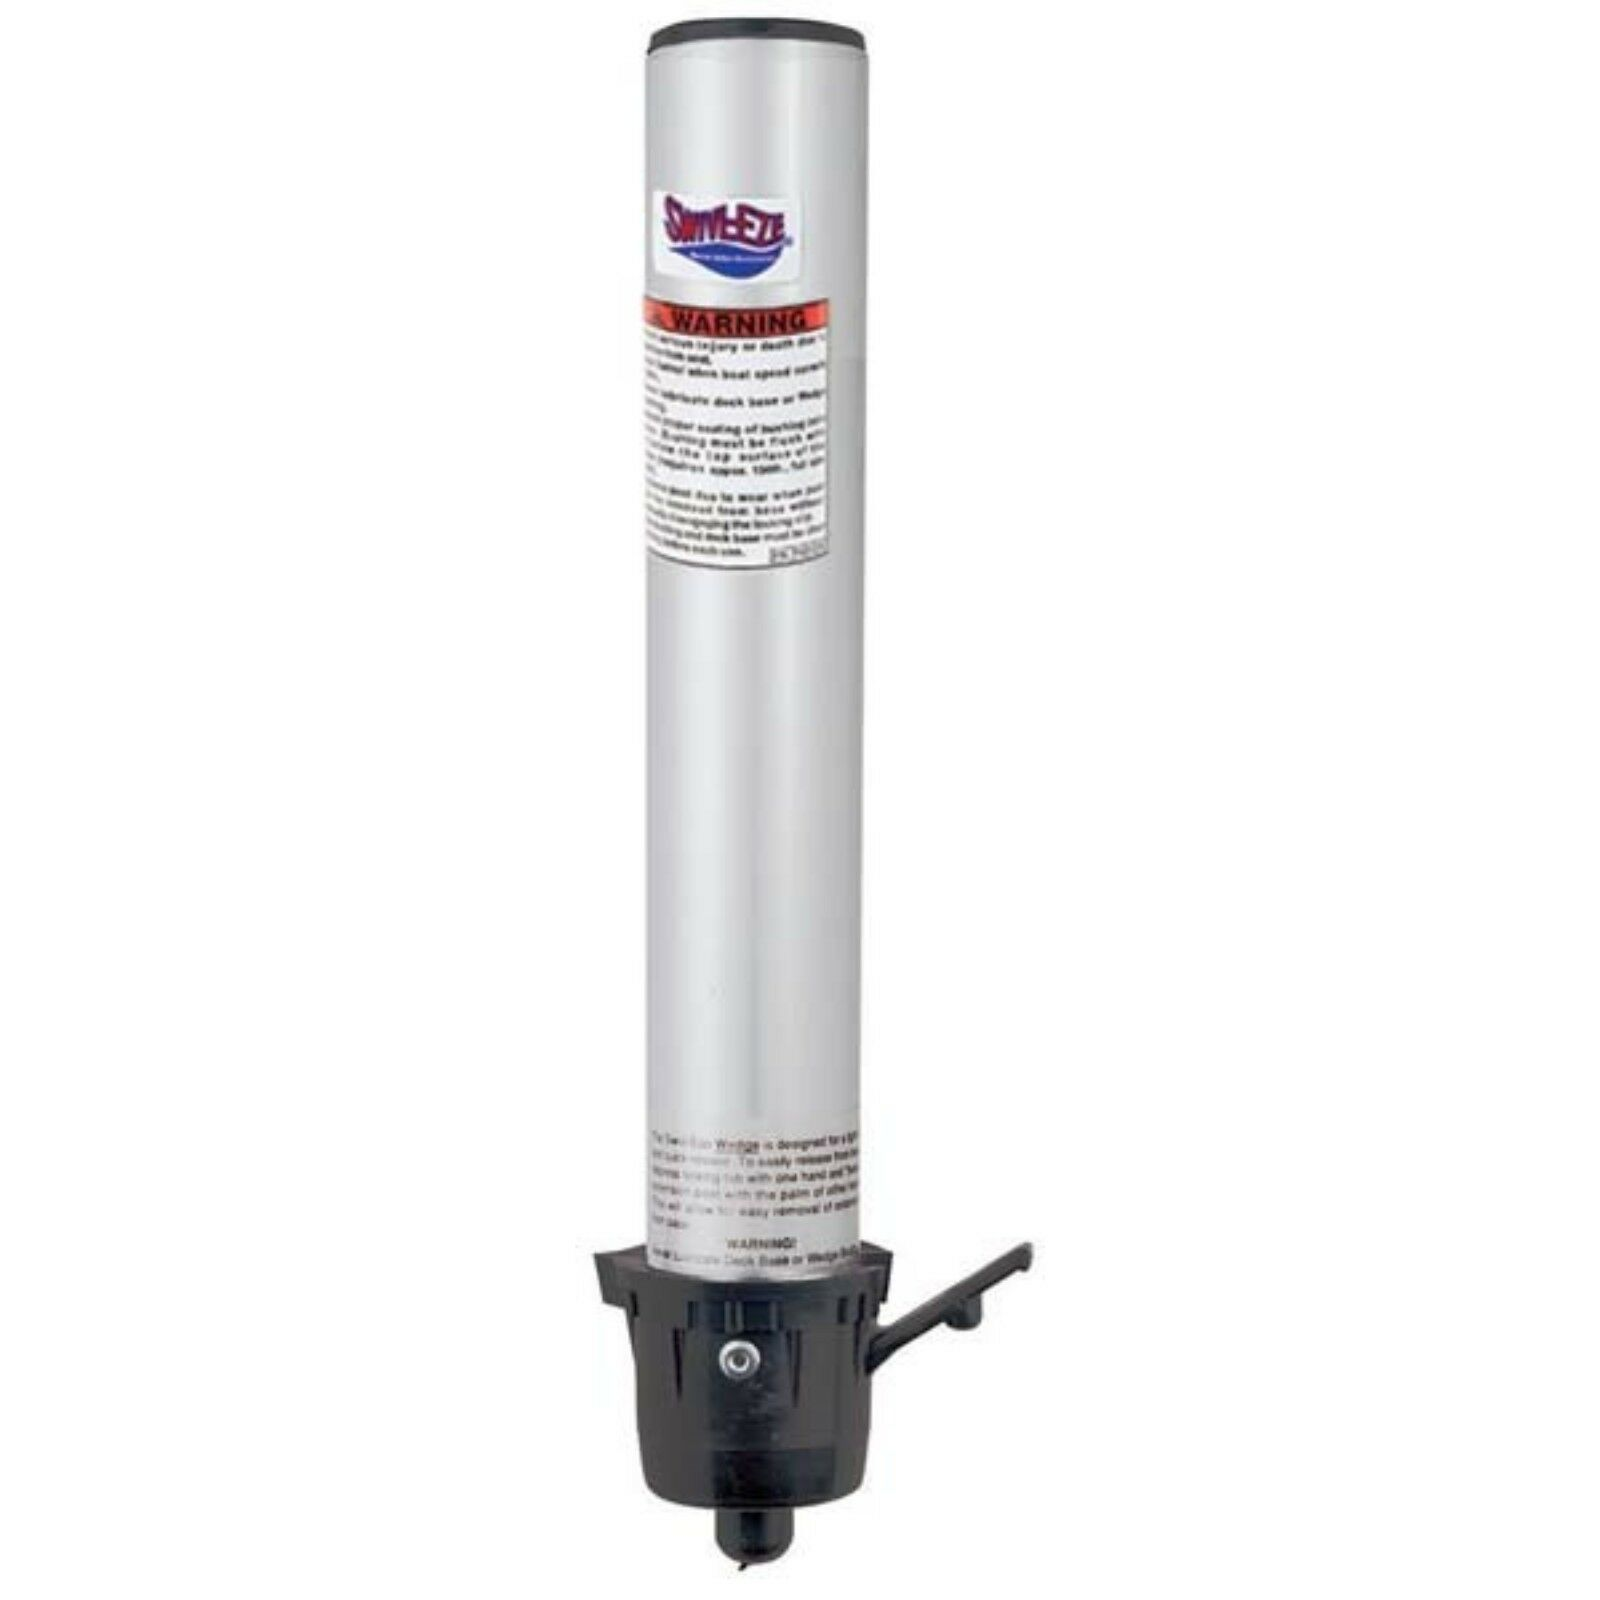 Swivl-Eze Sp28913 Wedge Pedestal Post 13